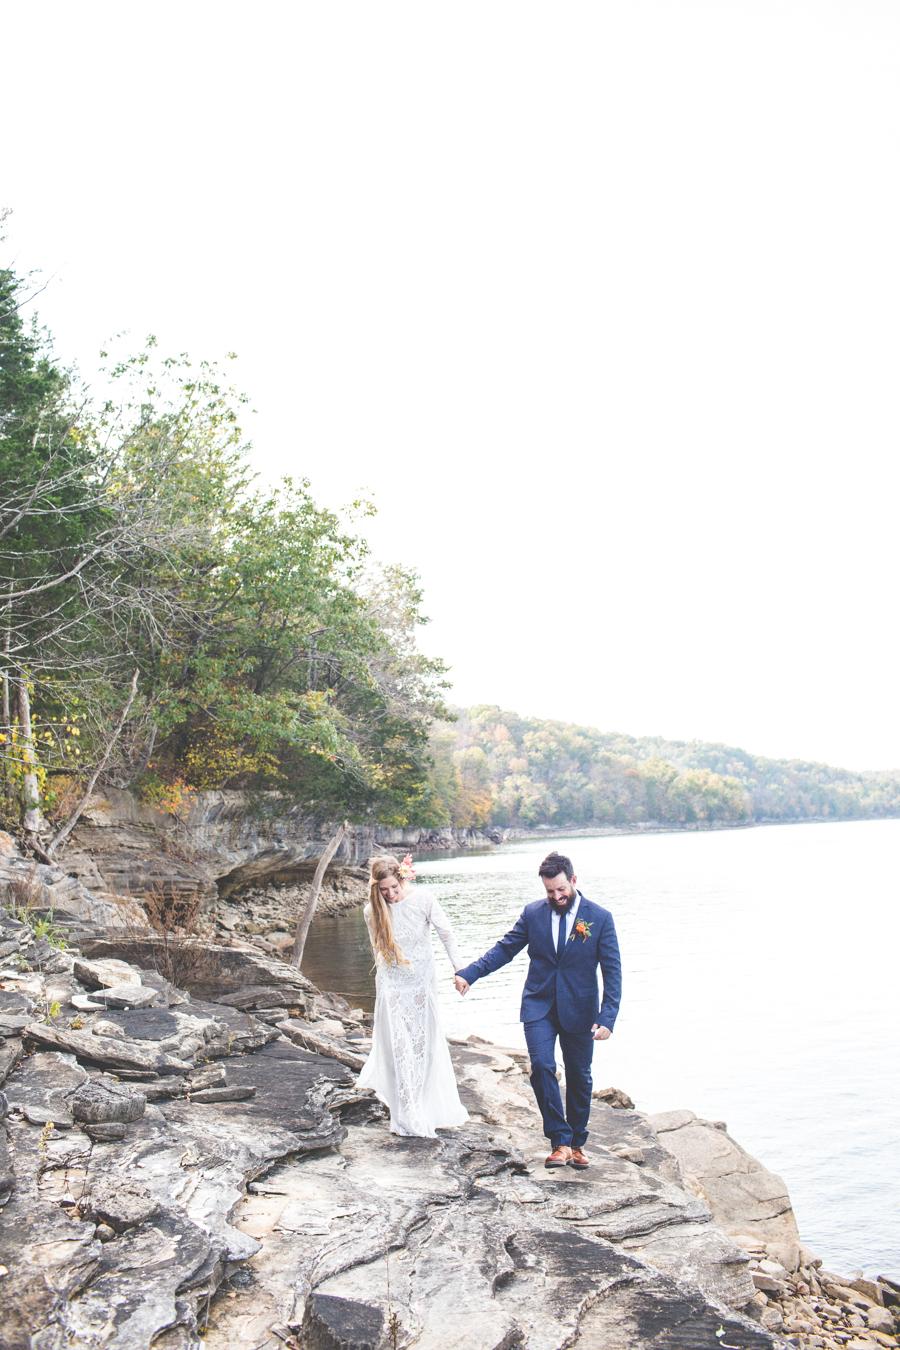 Kelsey_Ryan_Wedding_Blog-1-32.jpg